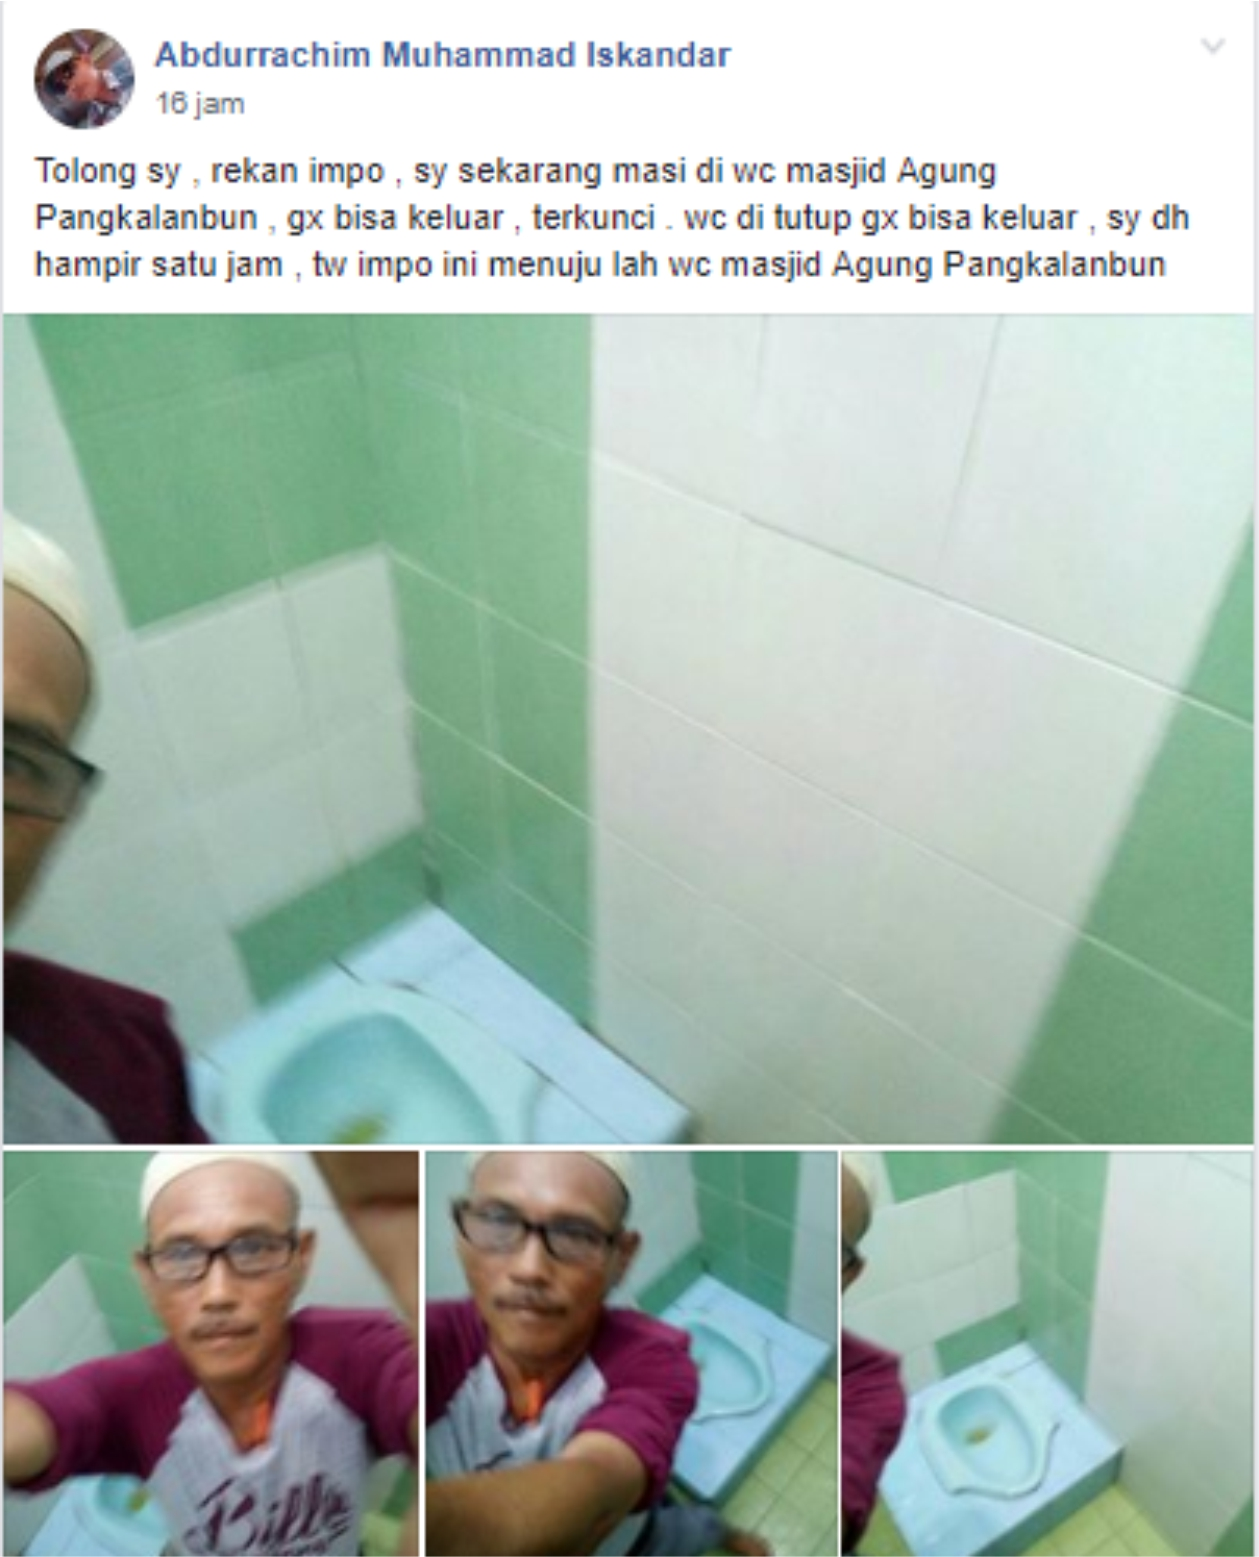 Seorang Pria Terjebak di Dalam WC Masjid Agung Pangkalanbun